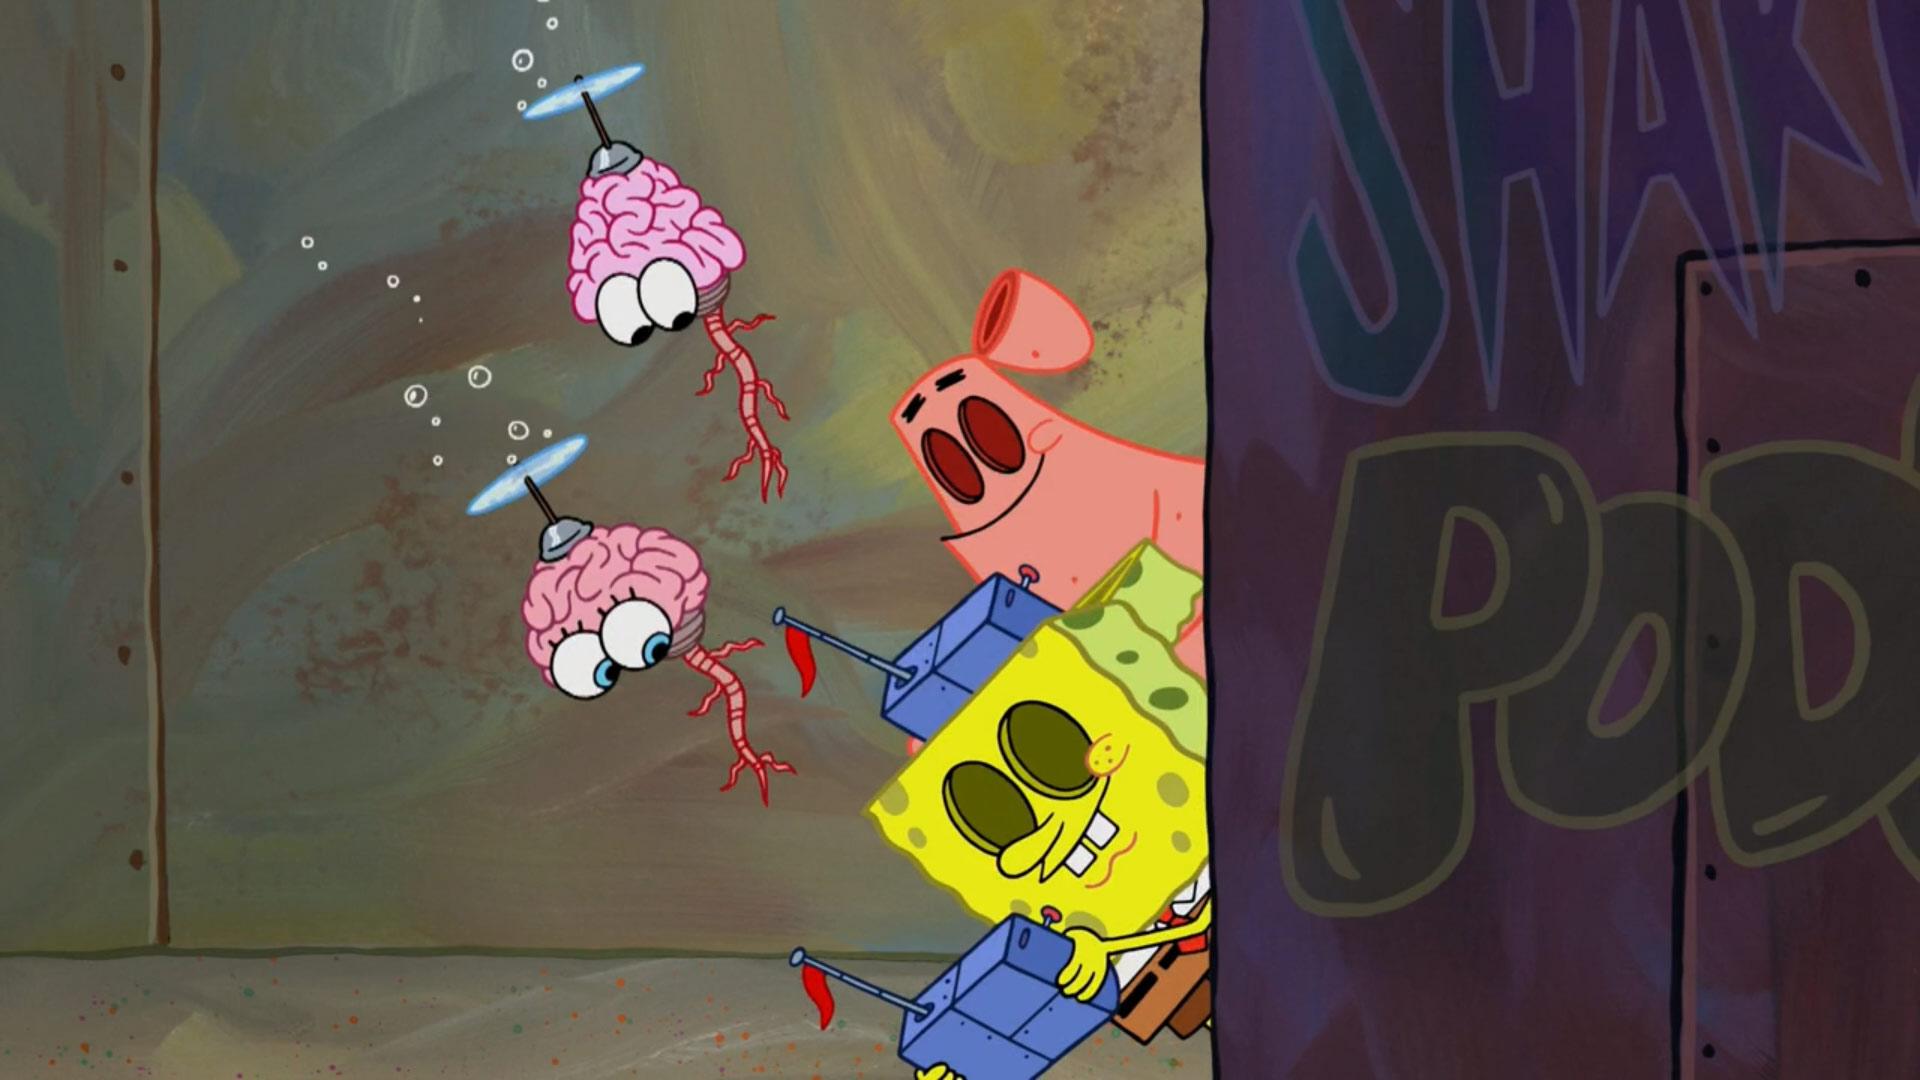 spongebob squarepants the incredible shrinking sponge watch online